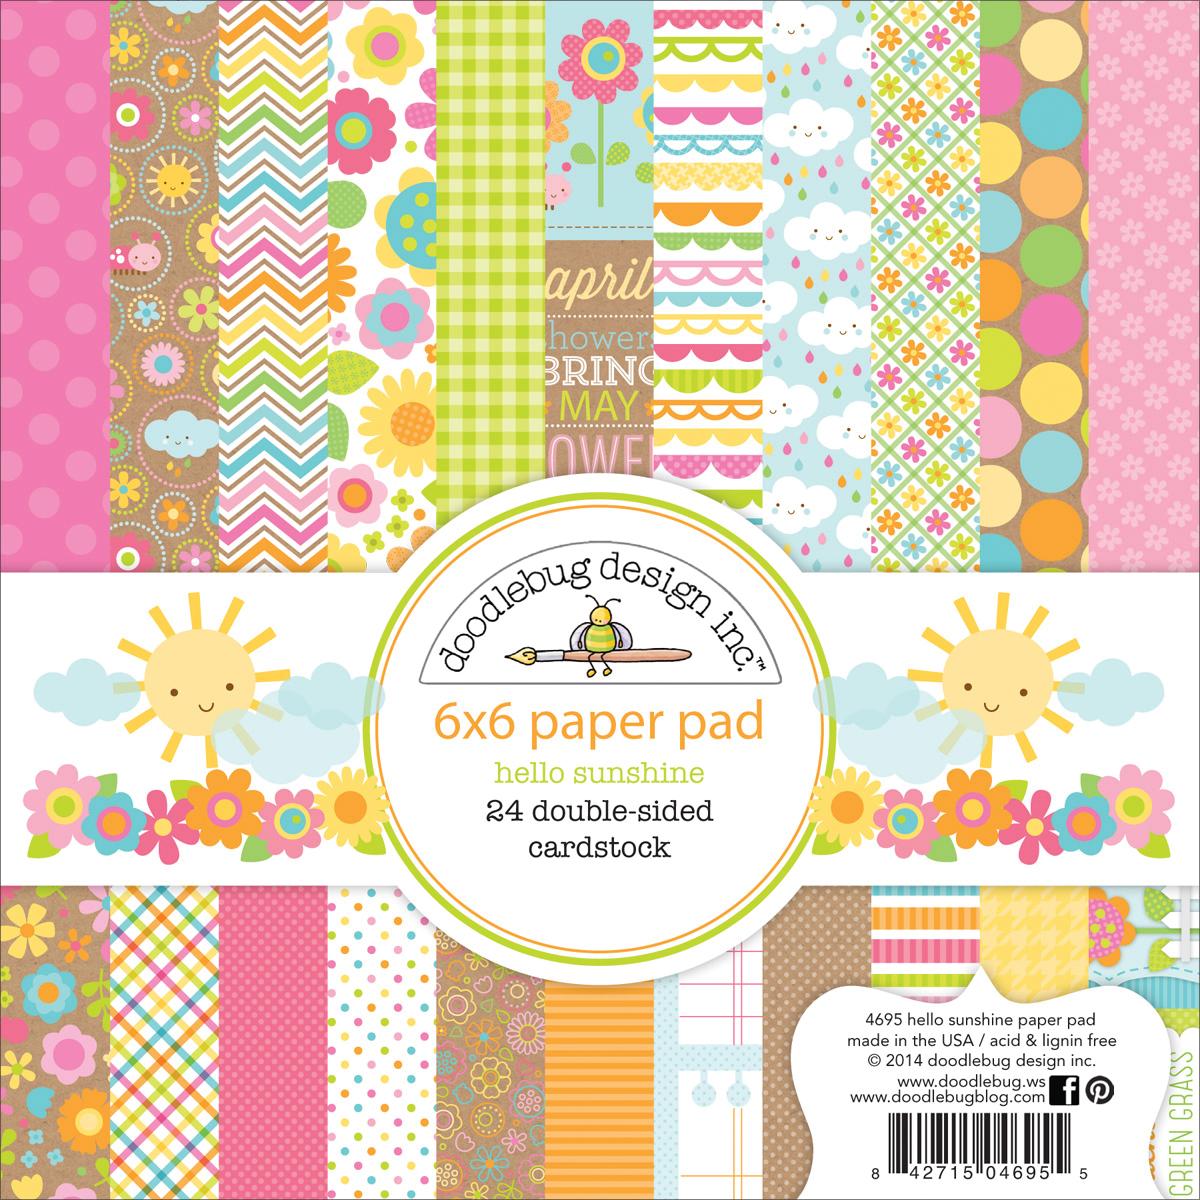 Doodlebug Double-Sided Paper Pad 6X6 24/Pkg-Hello Sunshine, 12 Designs/2 Each